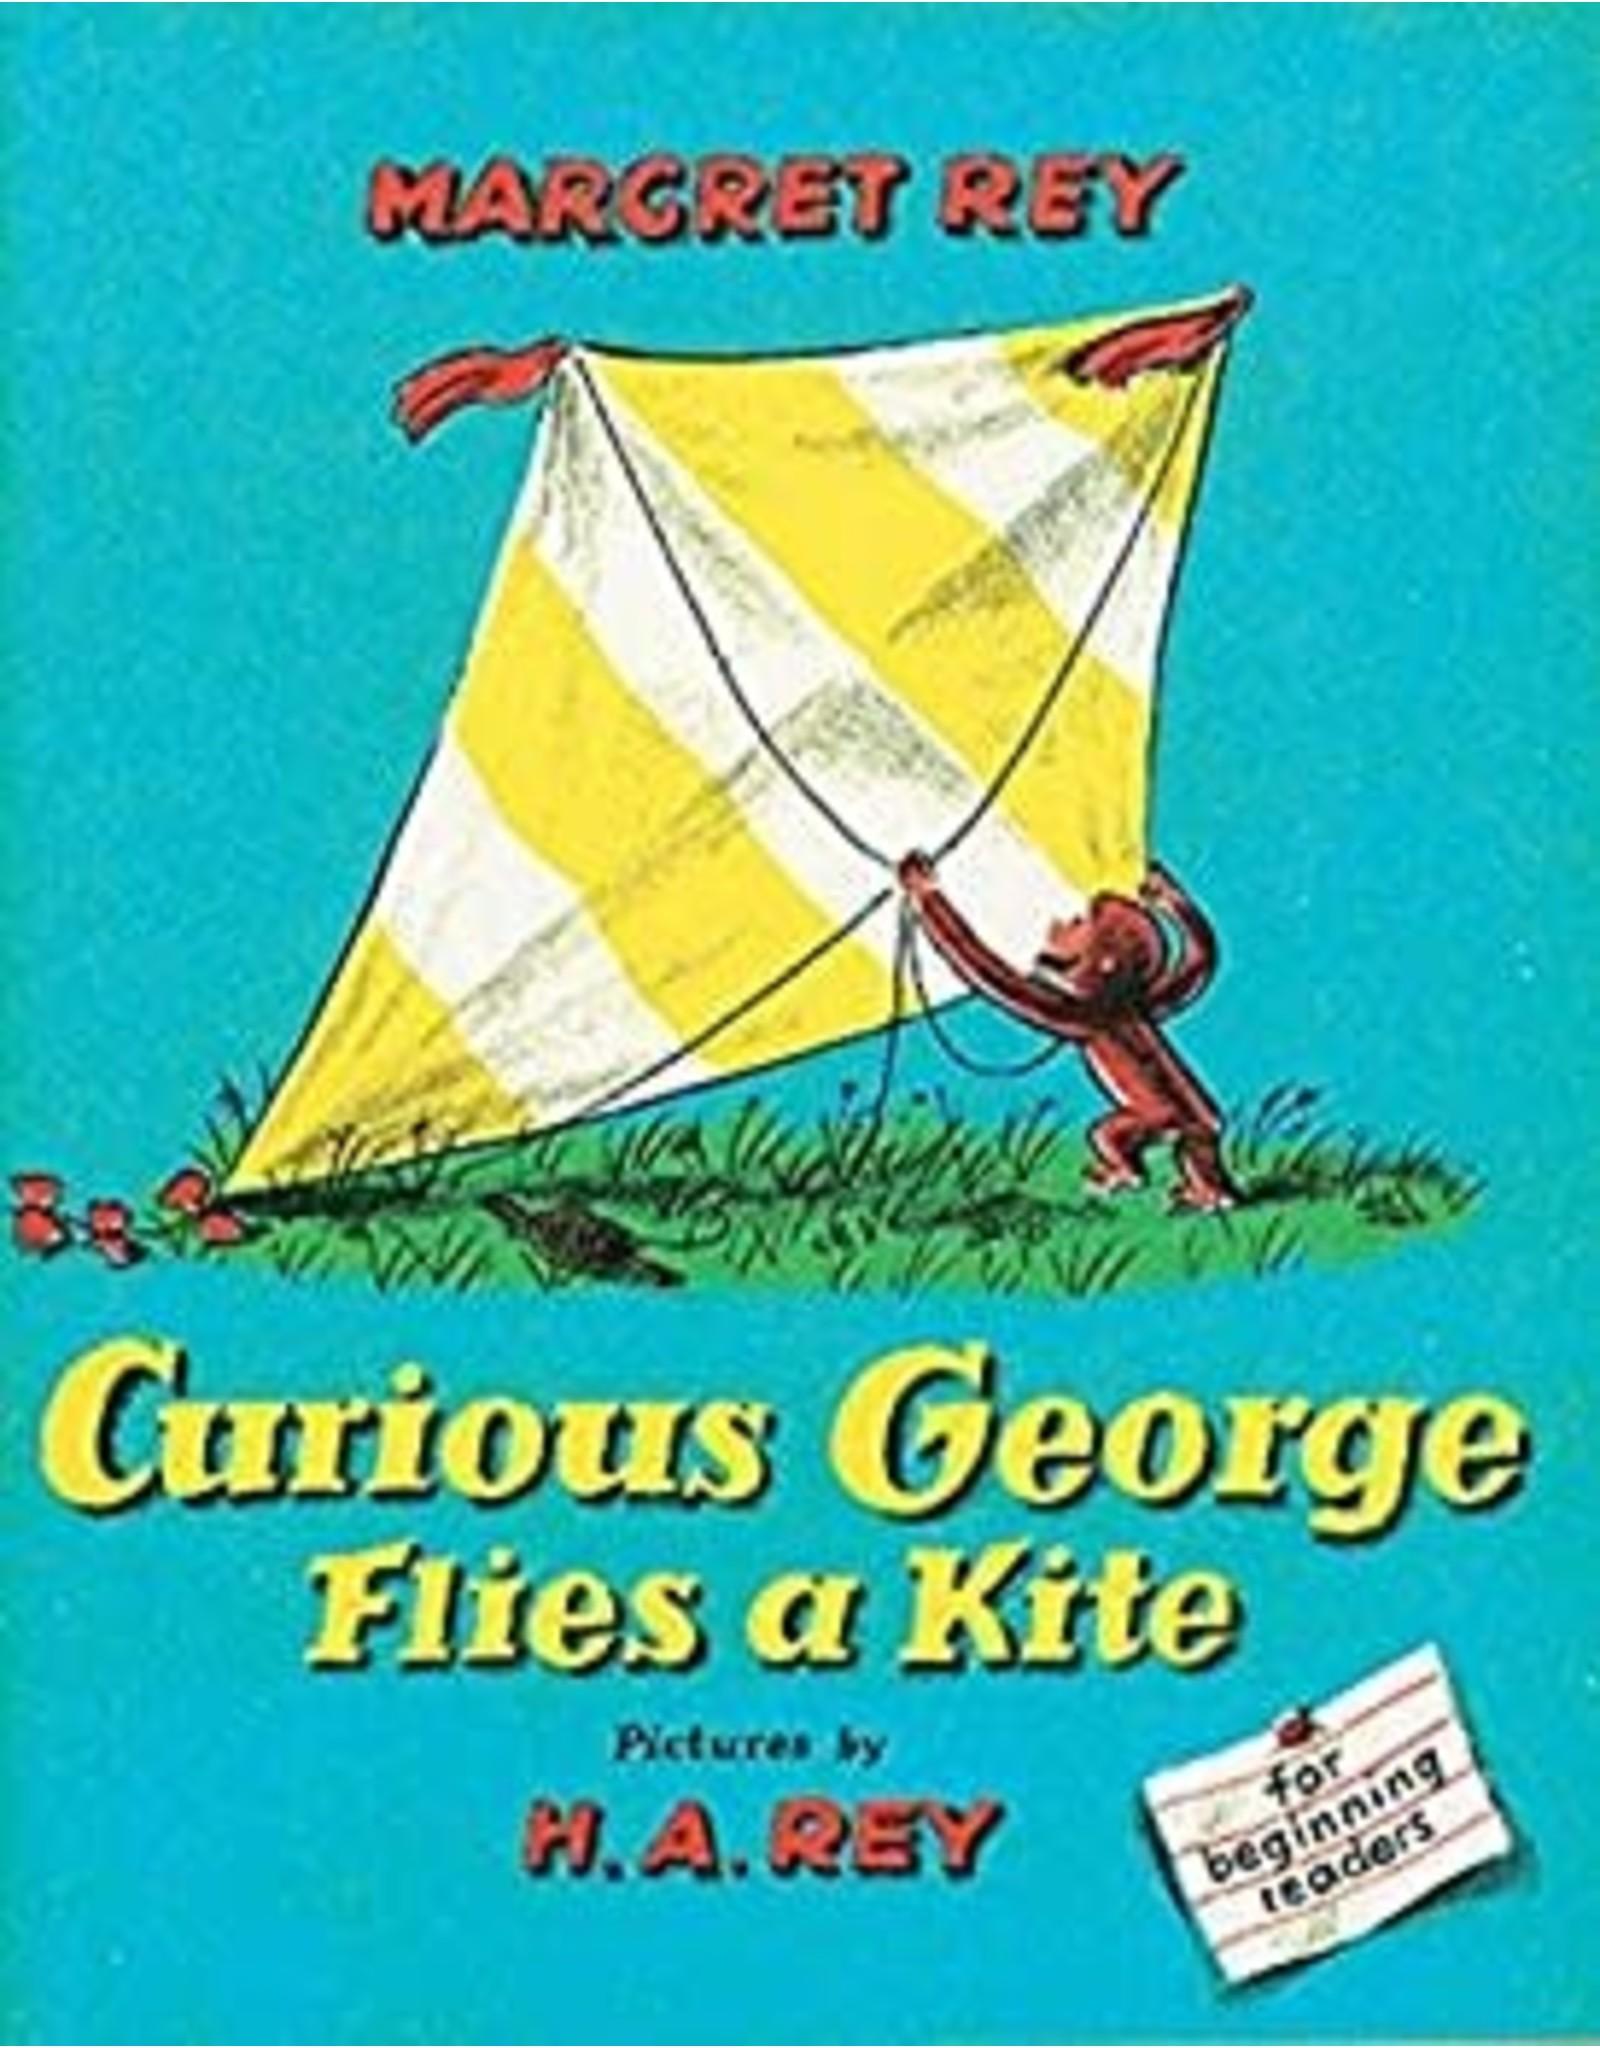 CURIOUS GEORGE FLIES A KITE PA